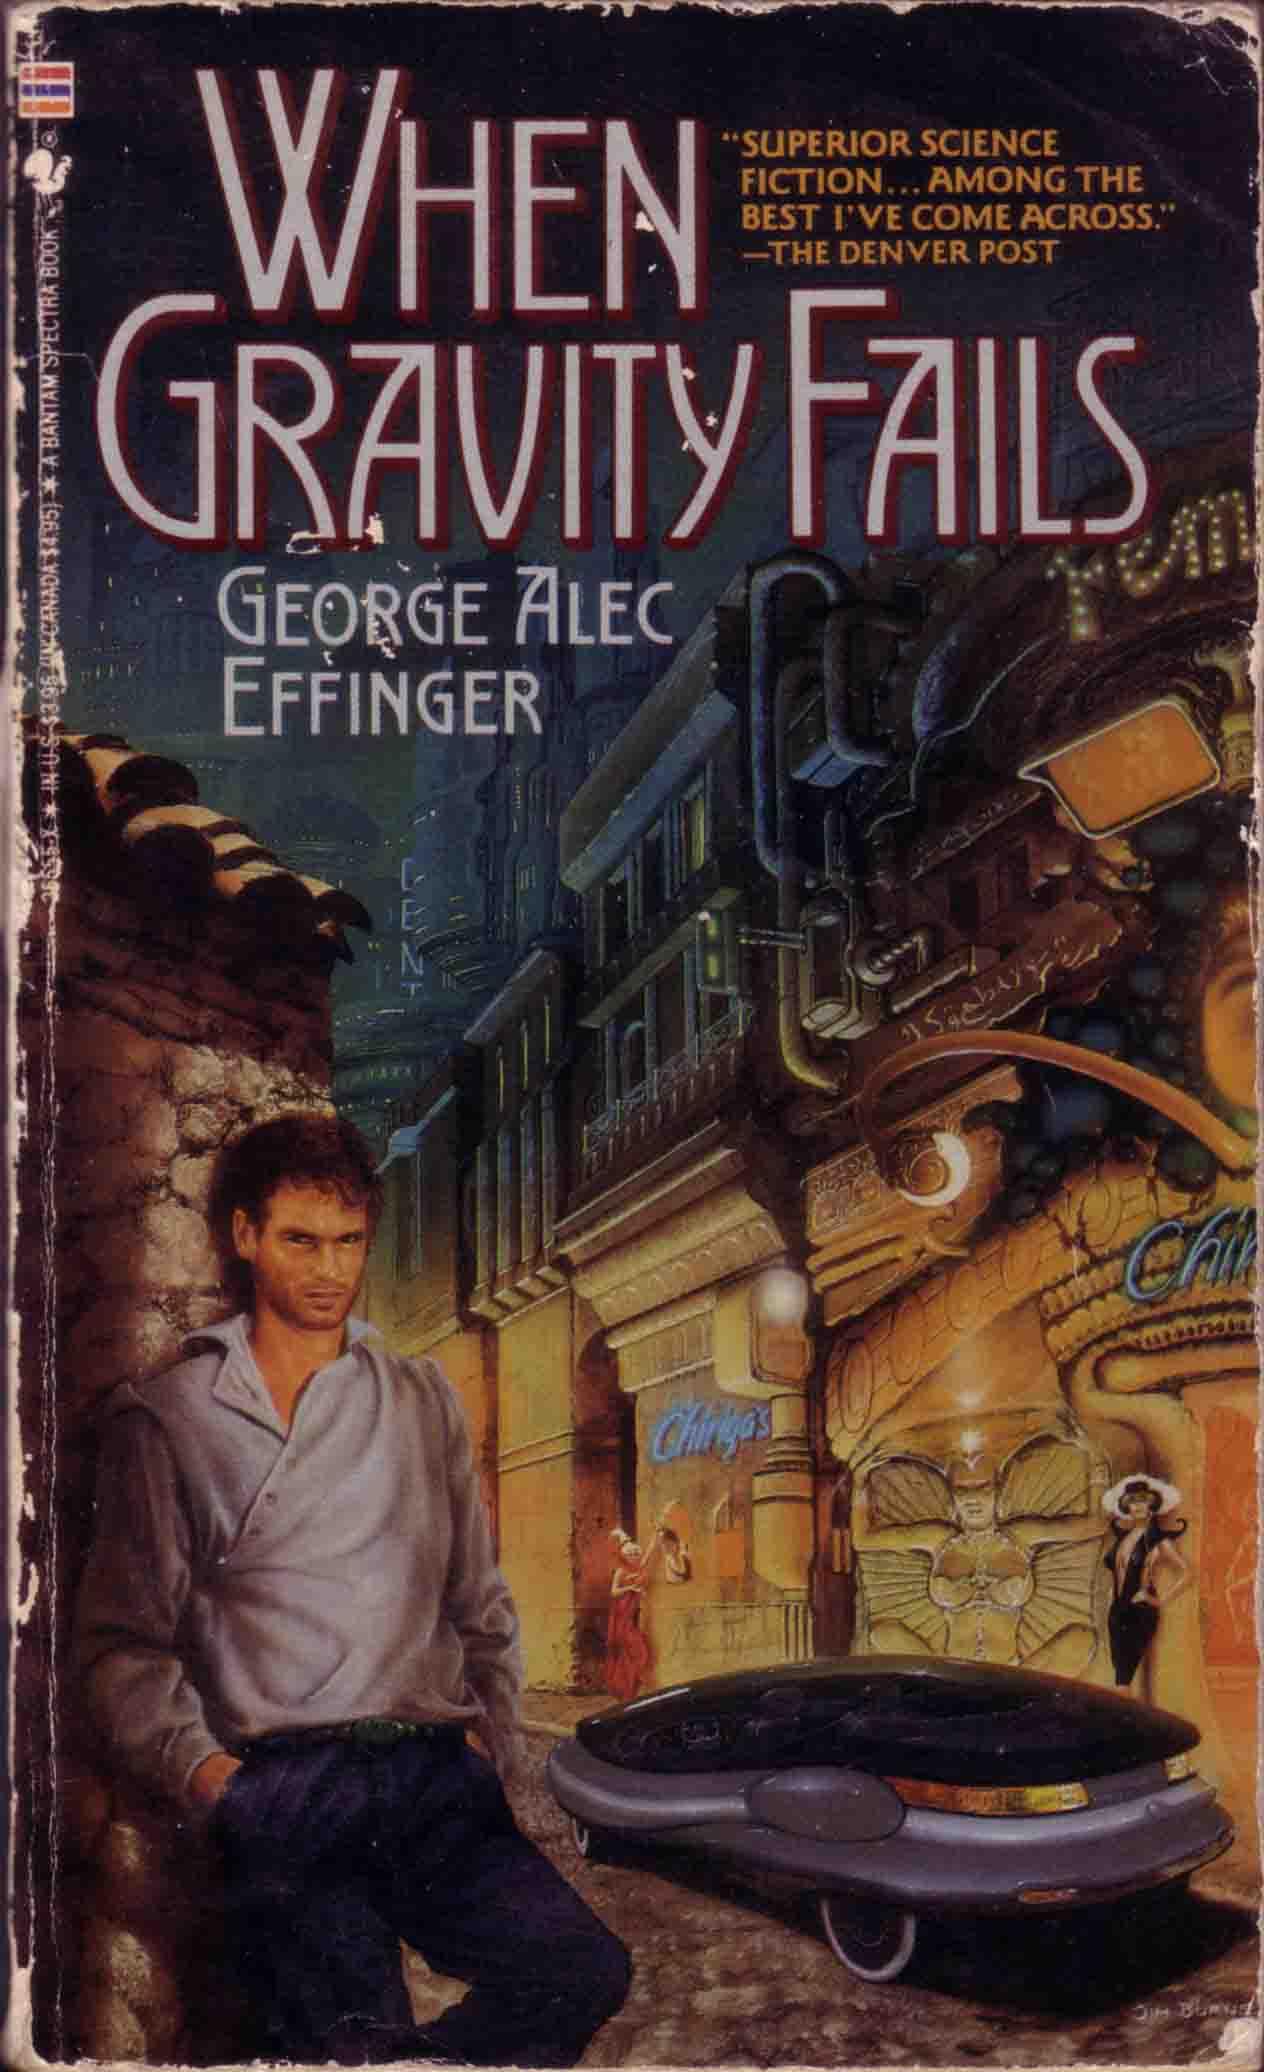 When Gravity Fails by George Alec Effinger Copyright 1988 Bantam Spectra  Cover art copyright Jim Burns